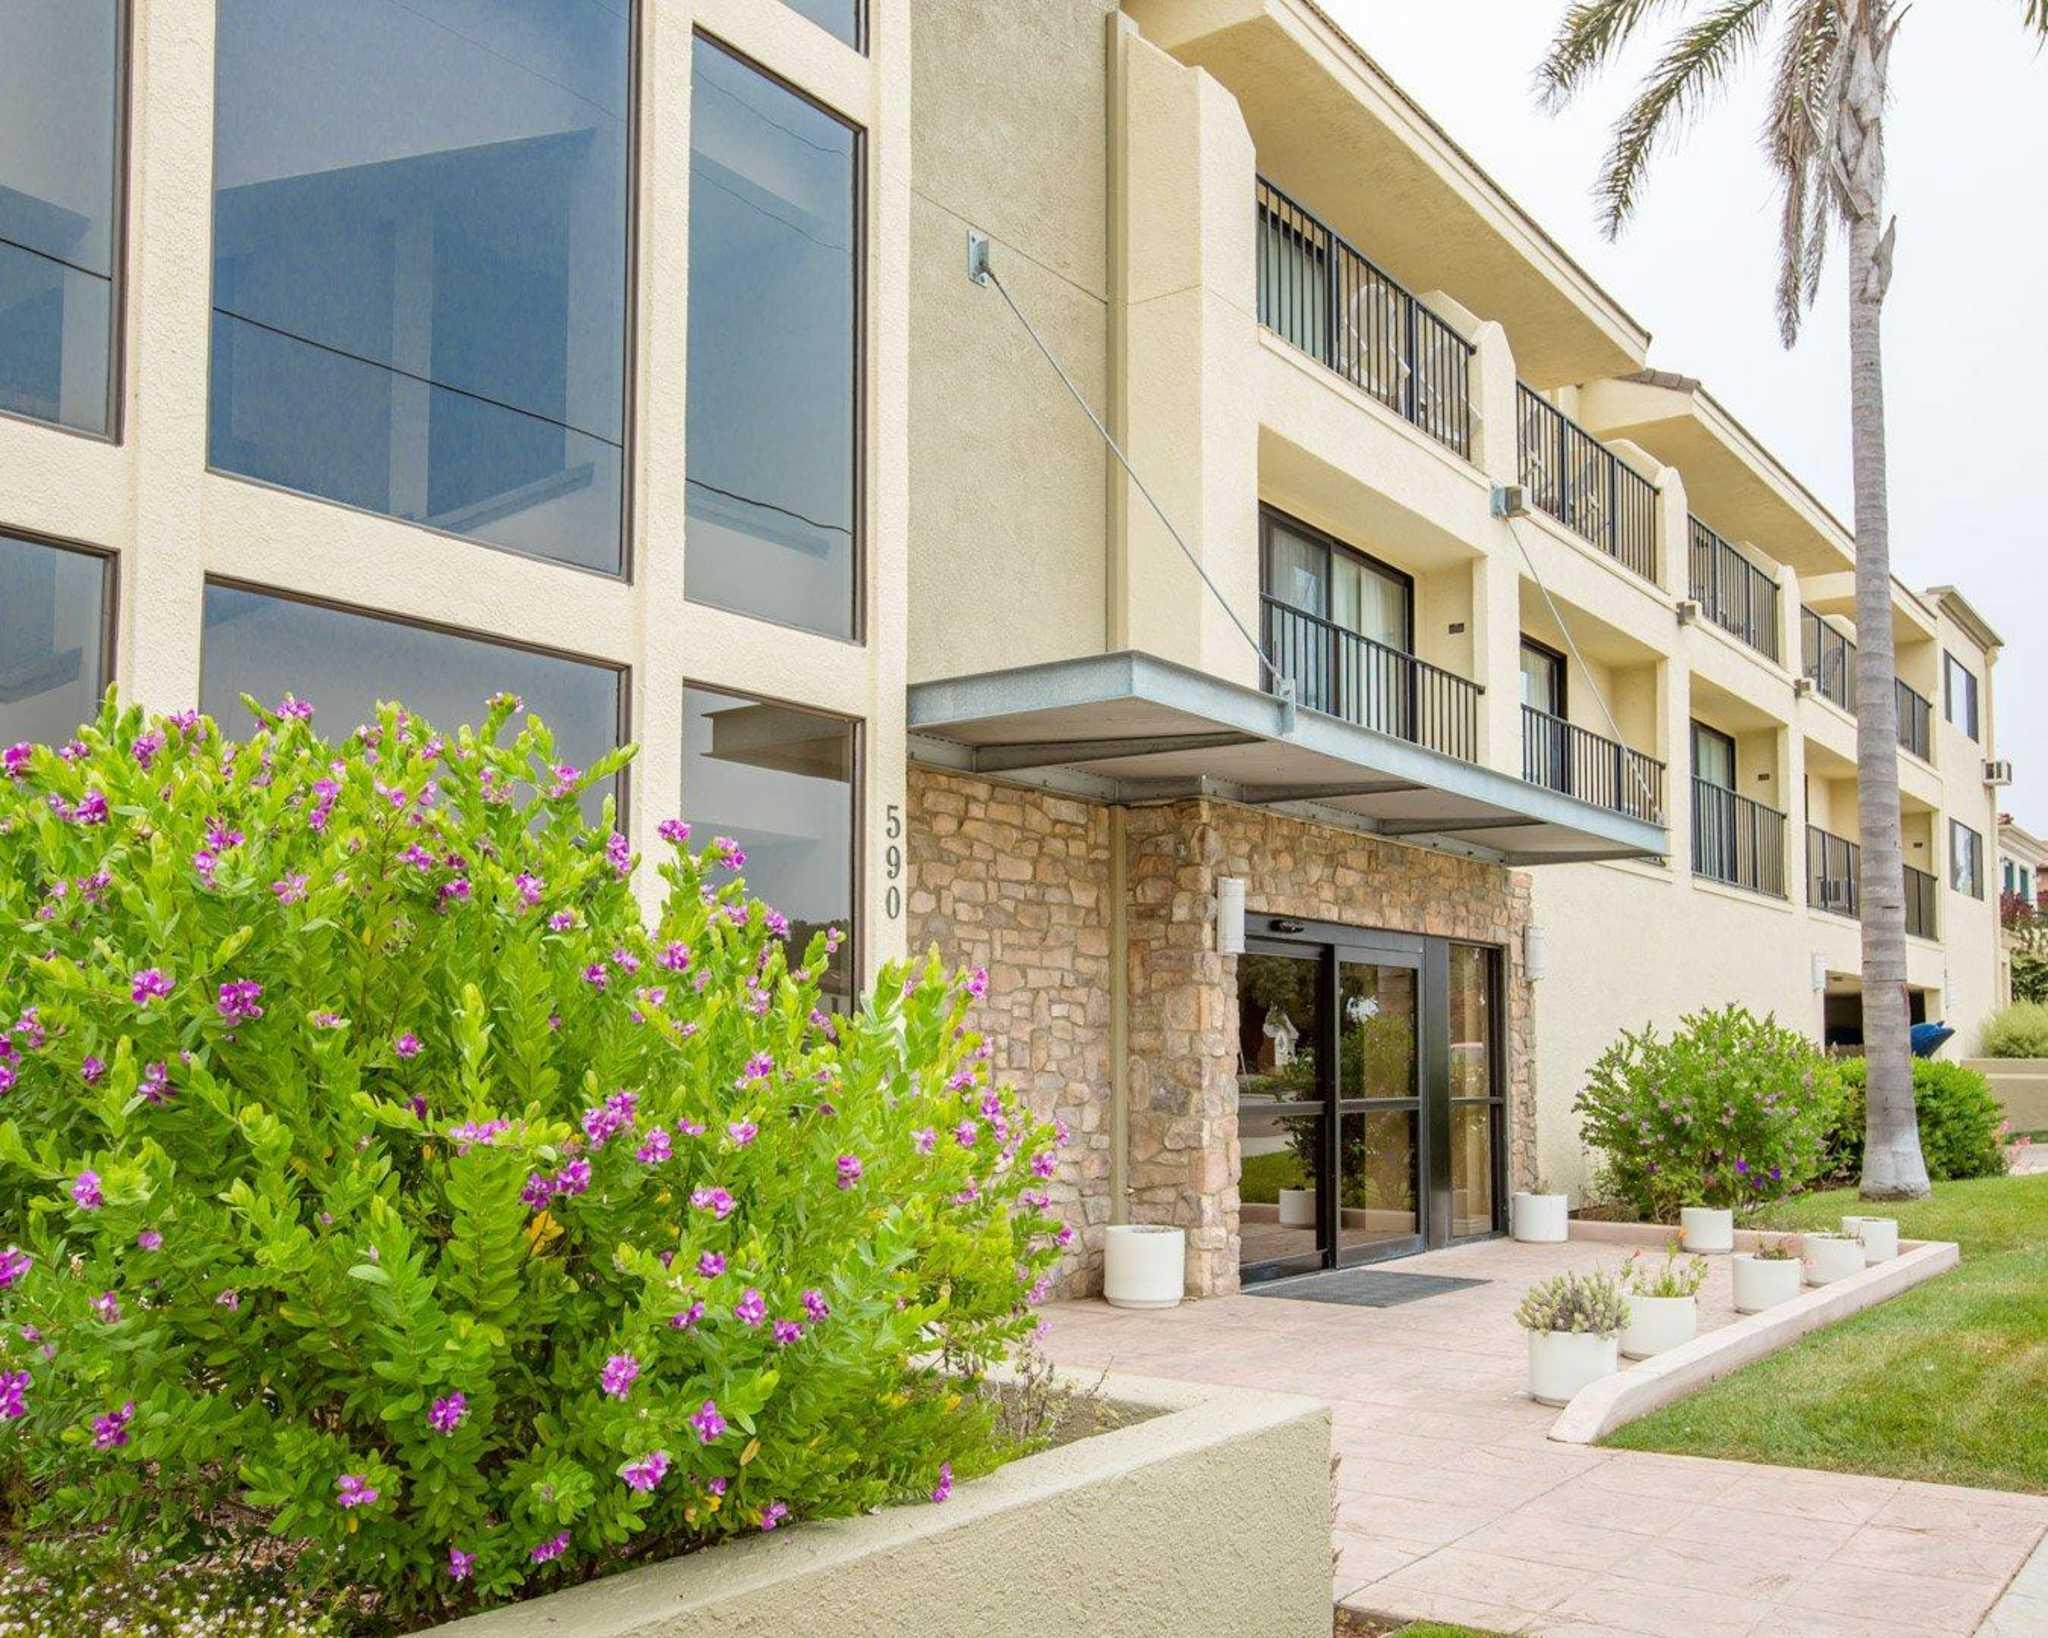 Comfort Inn San Marcos Ca Comfort Inn Escondido San Diego